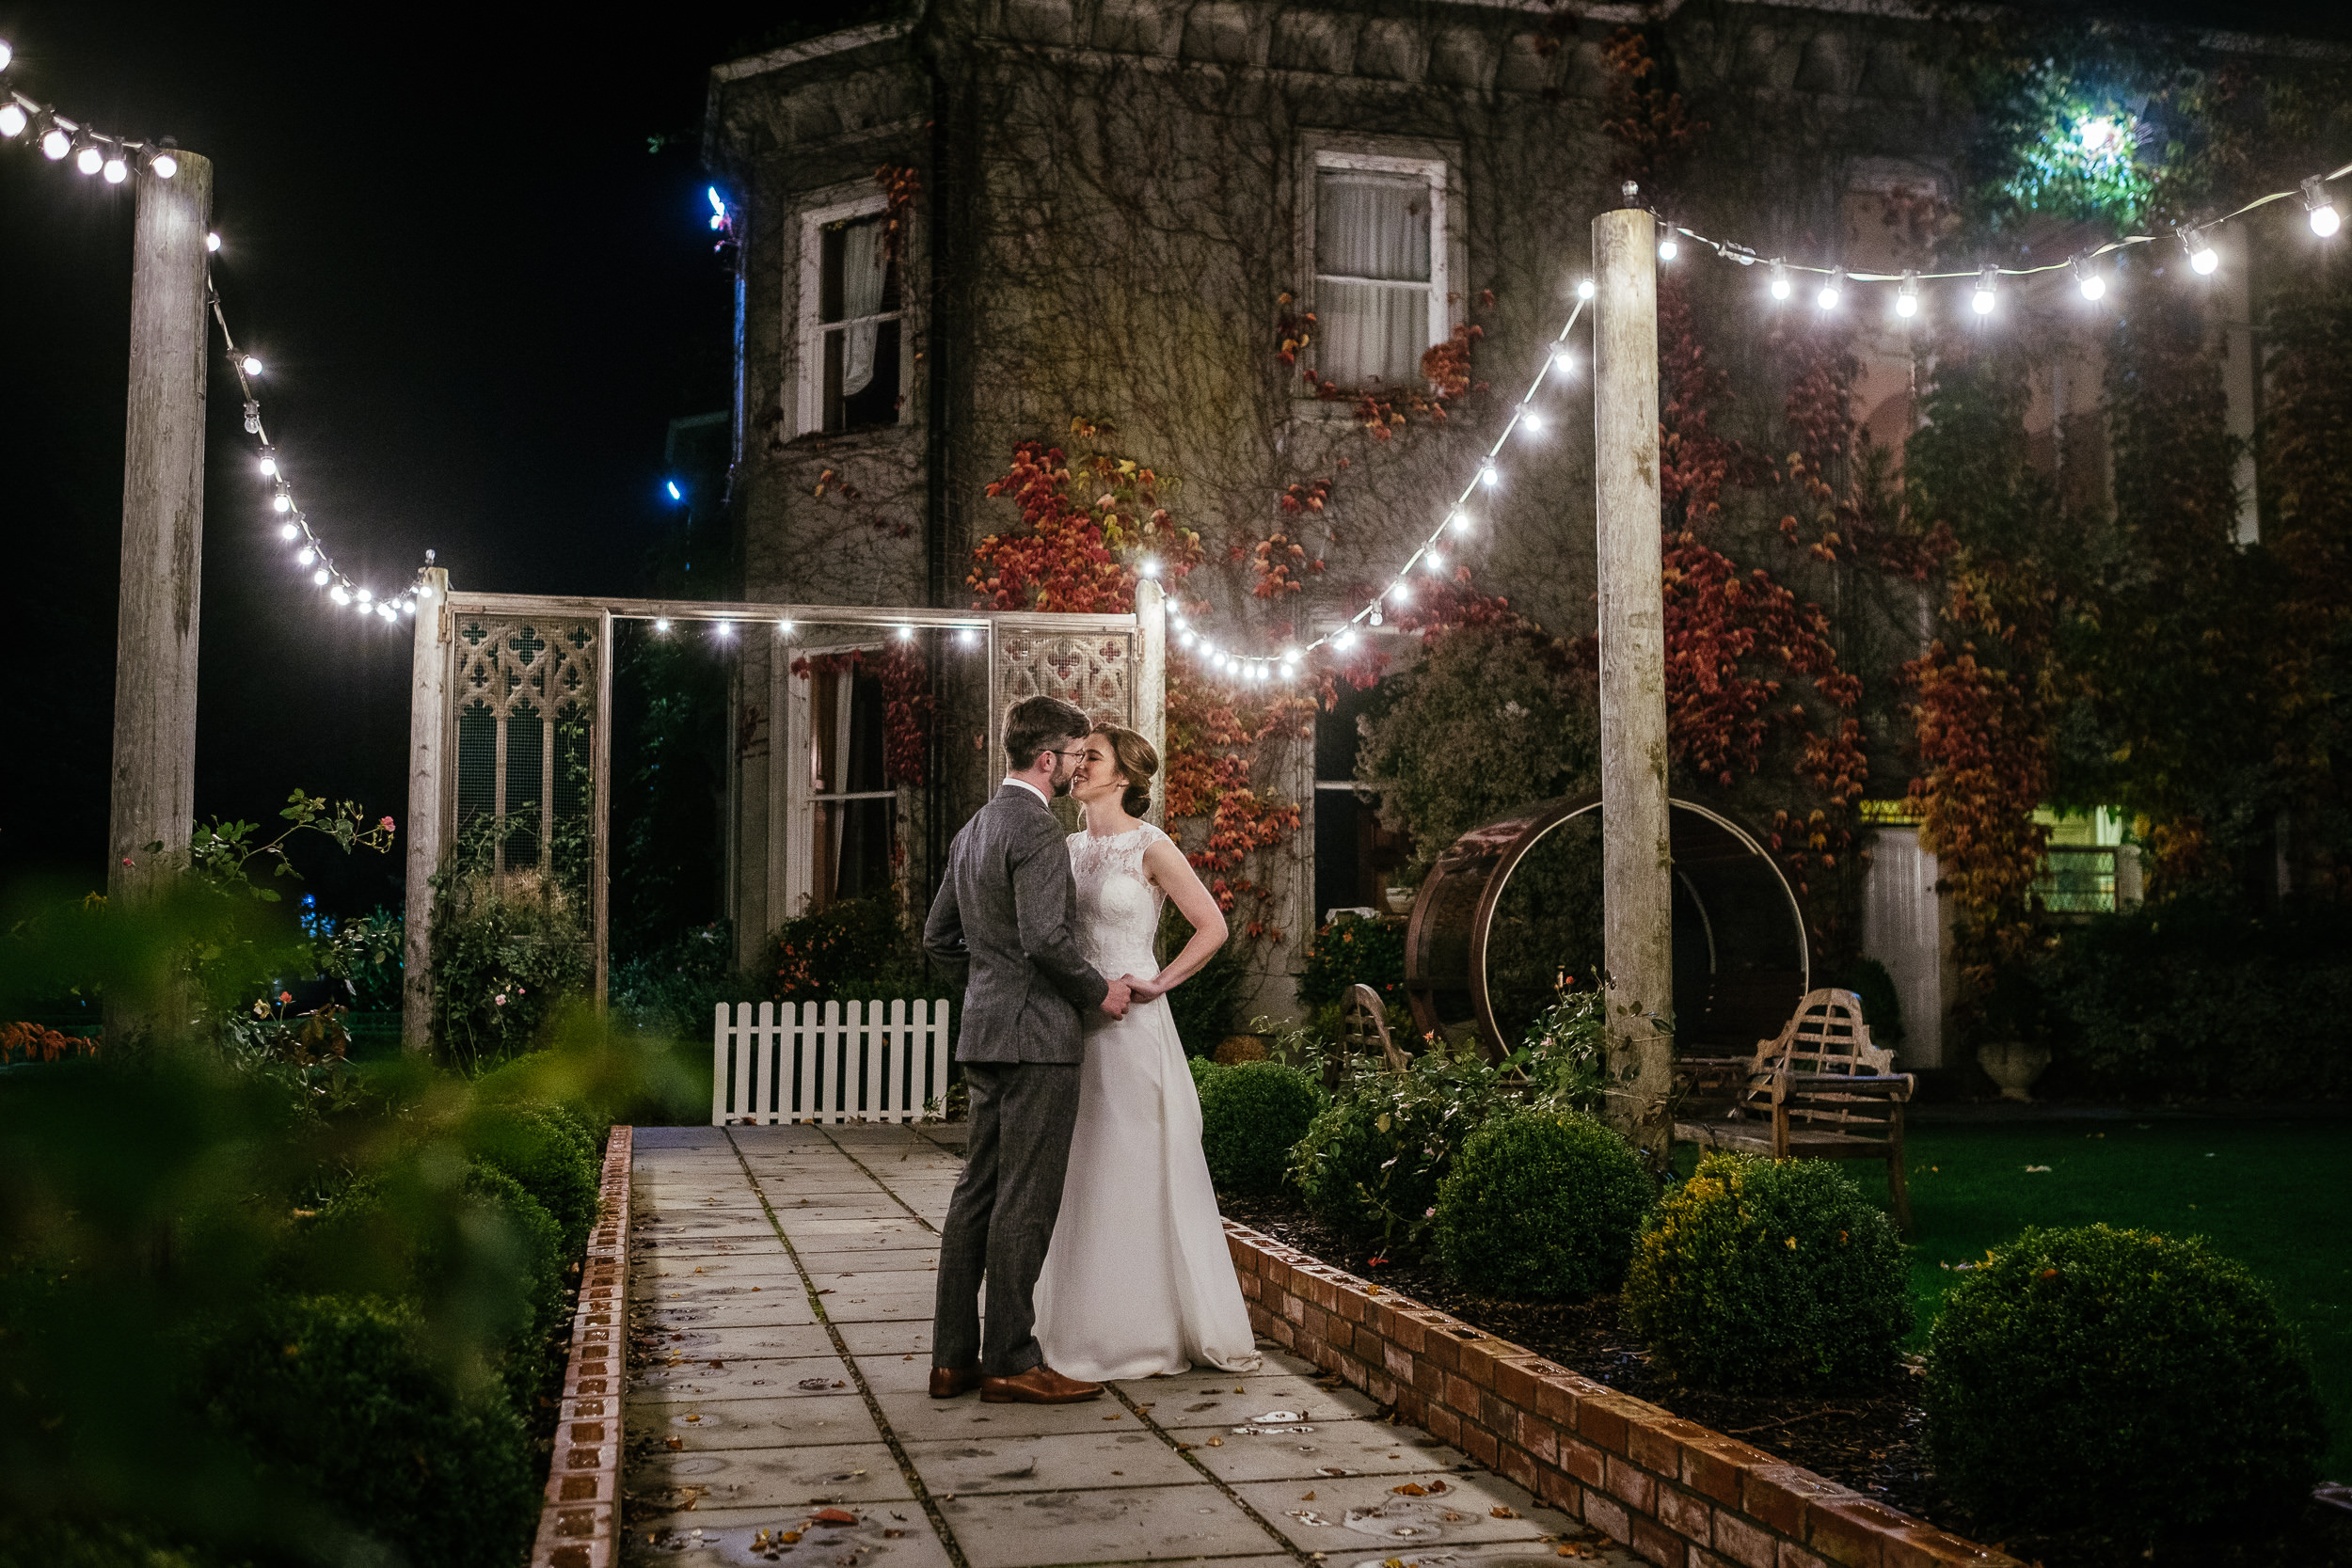 tinakilly house Wedding Photographer103